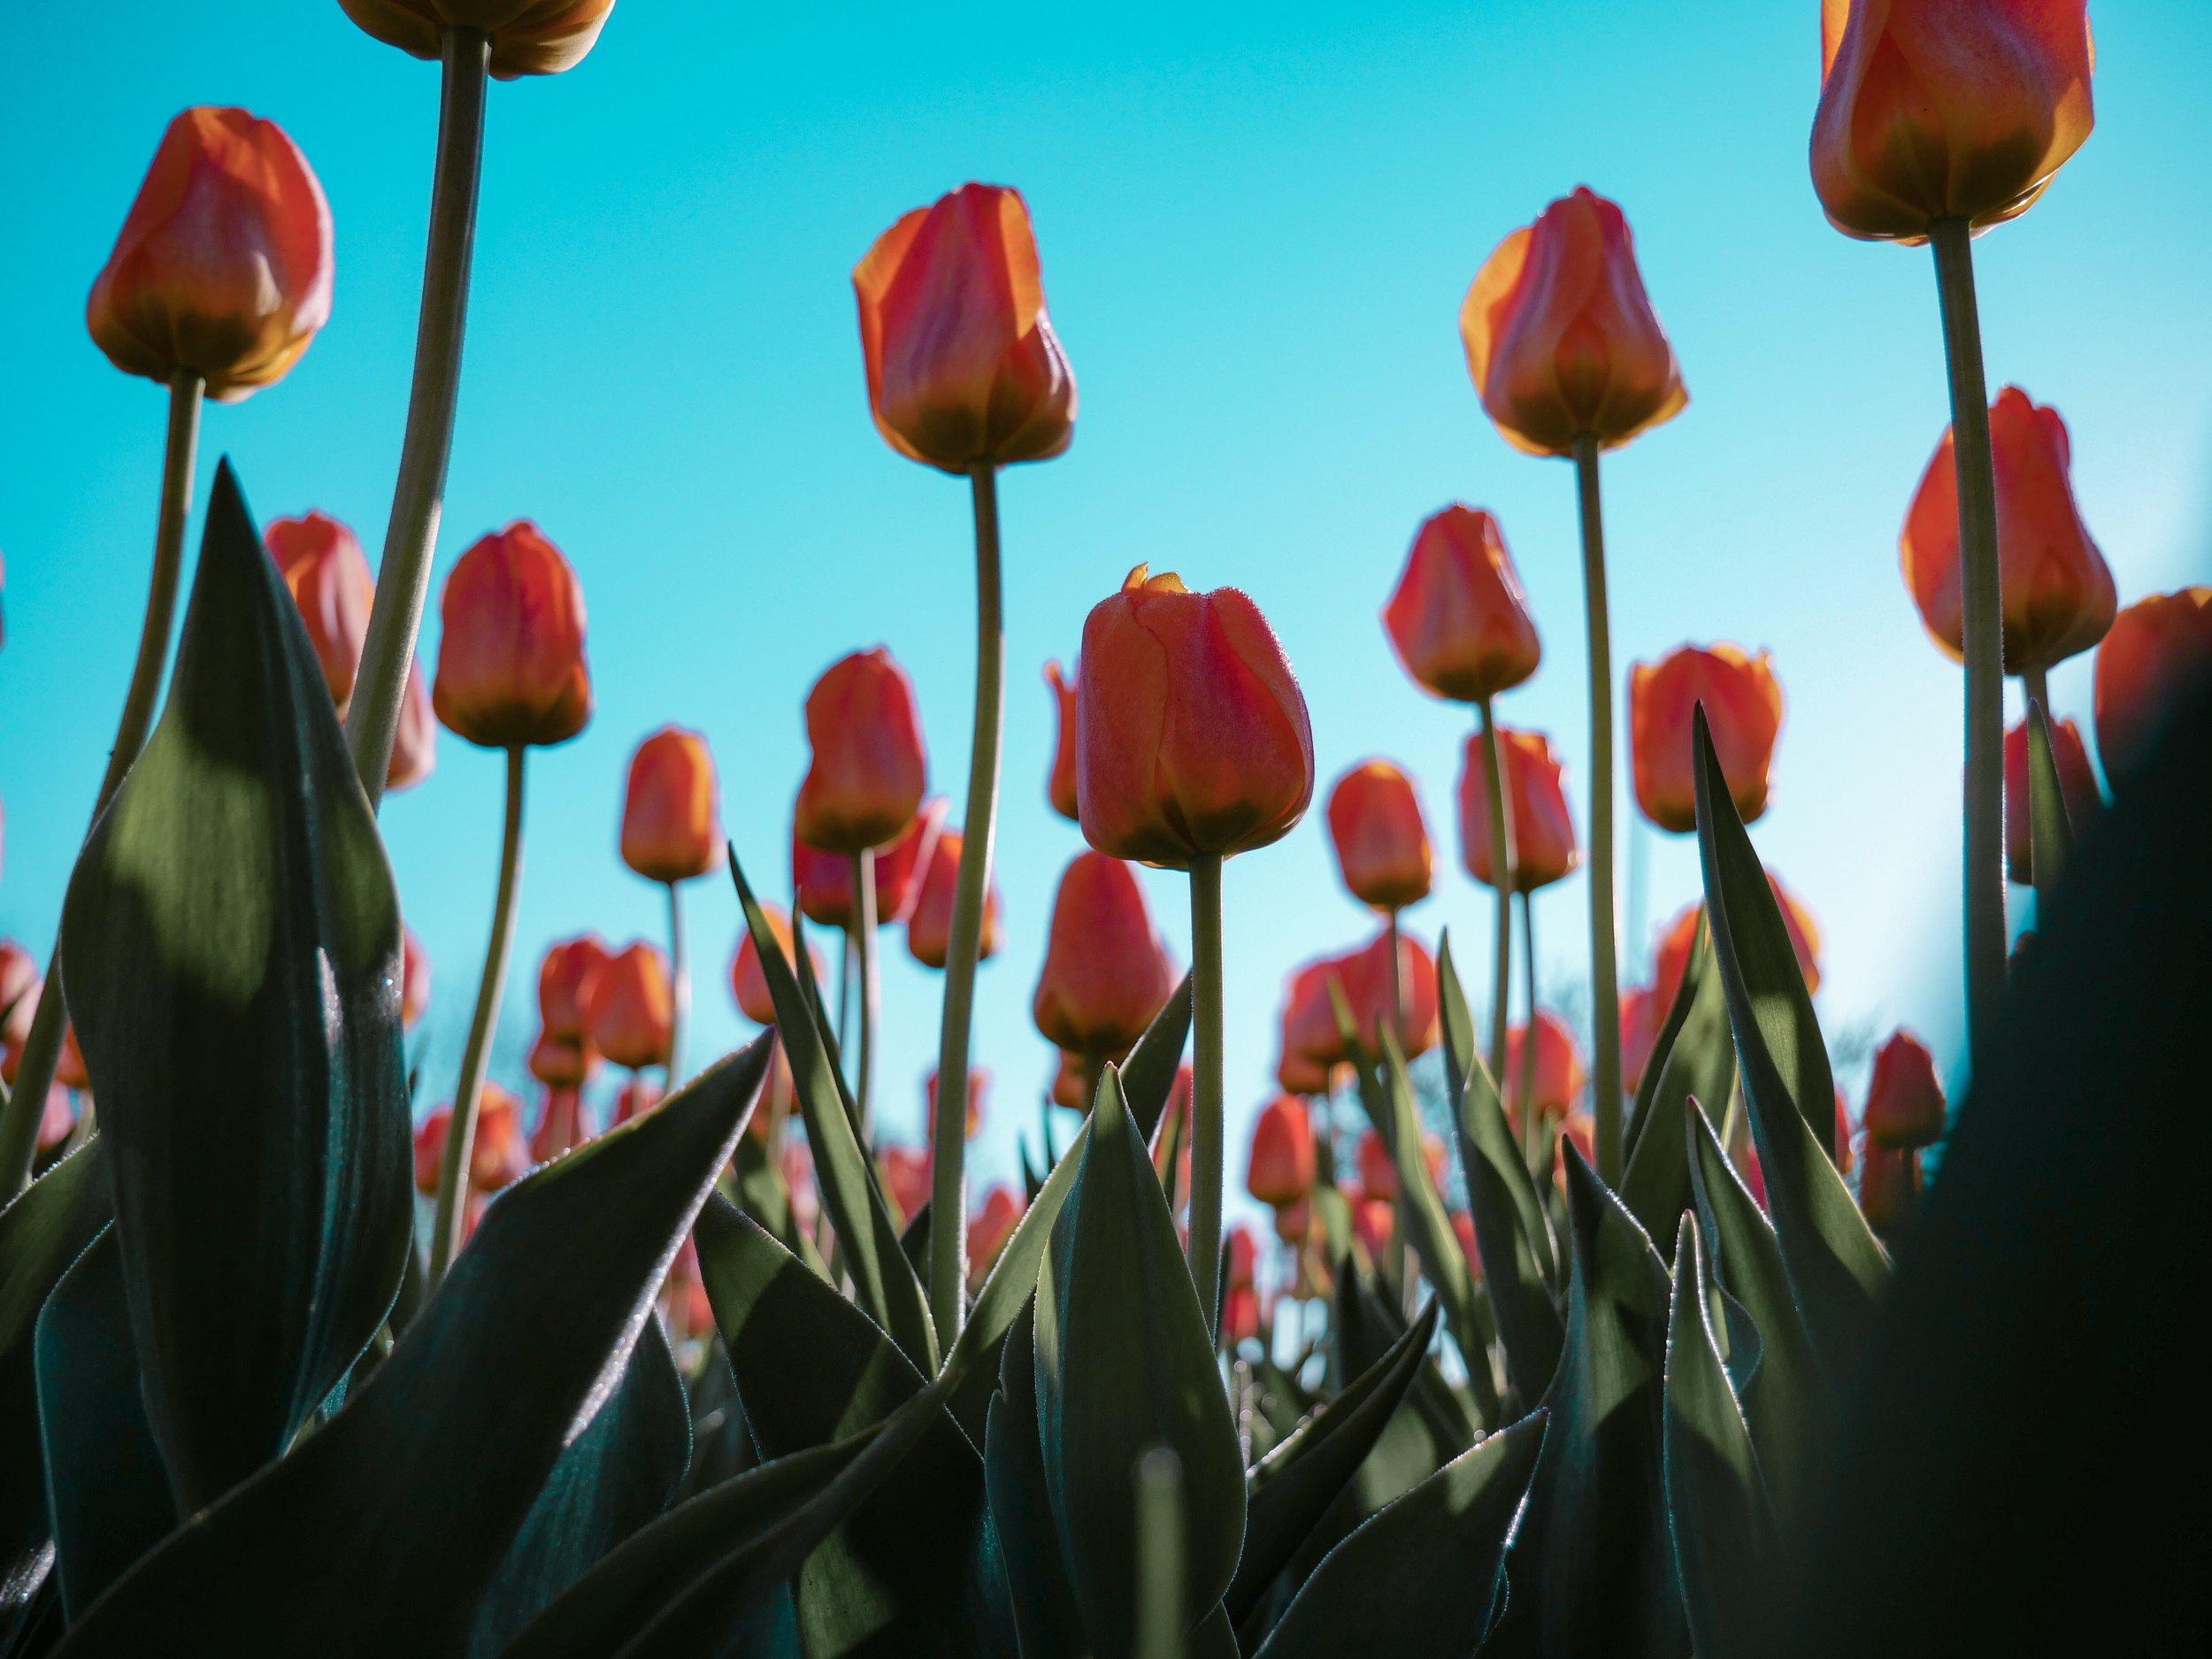 FLOWERS - UNSPLASH COLLECTION